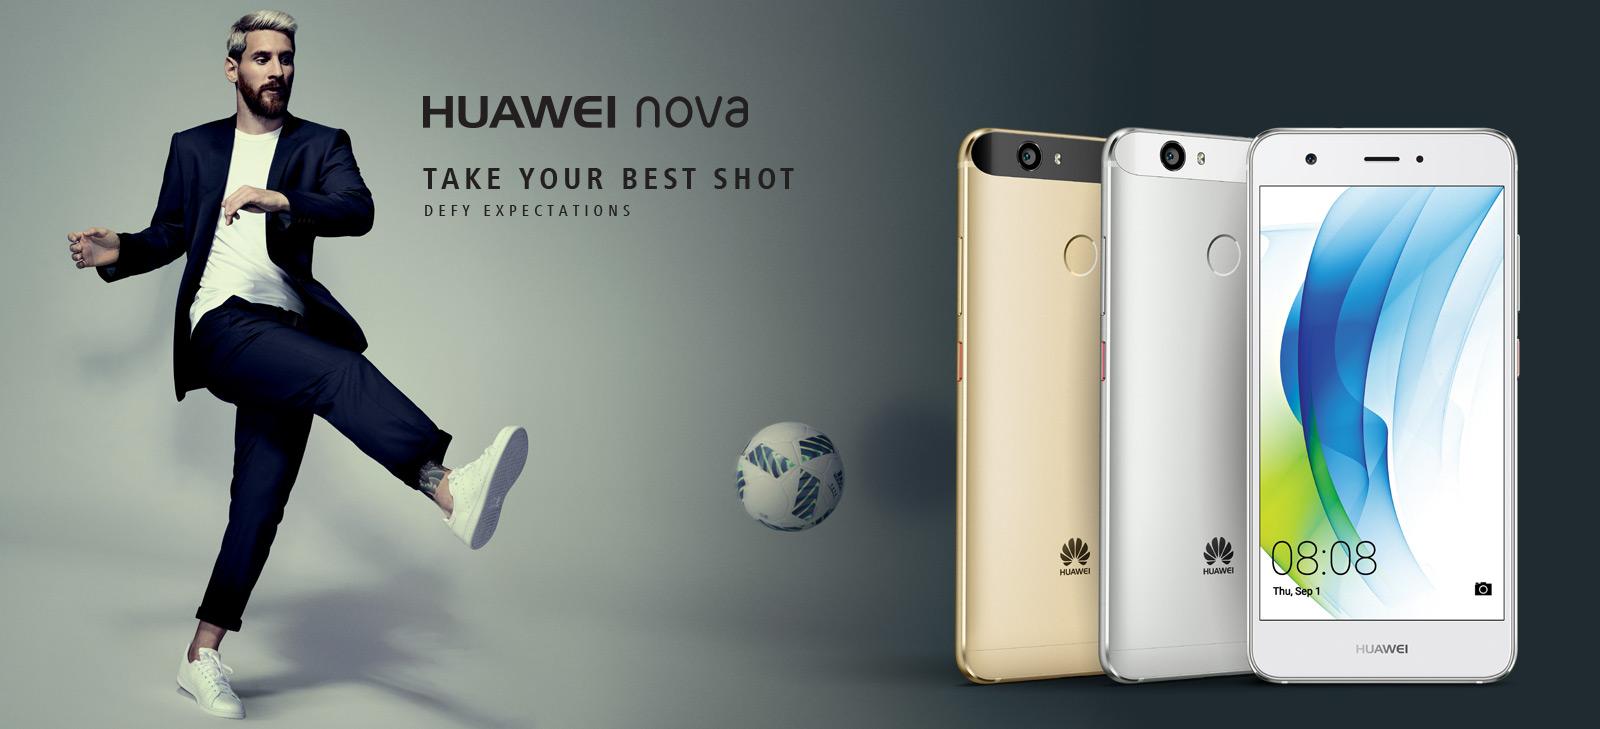 HUAWEI nova Smartphone | Mobile Phones | HUAWEI South Africa